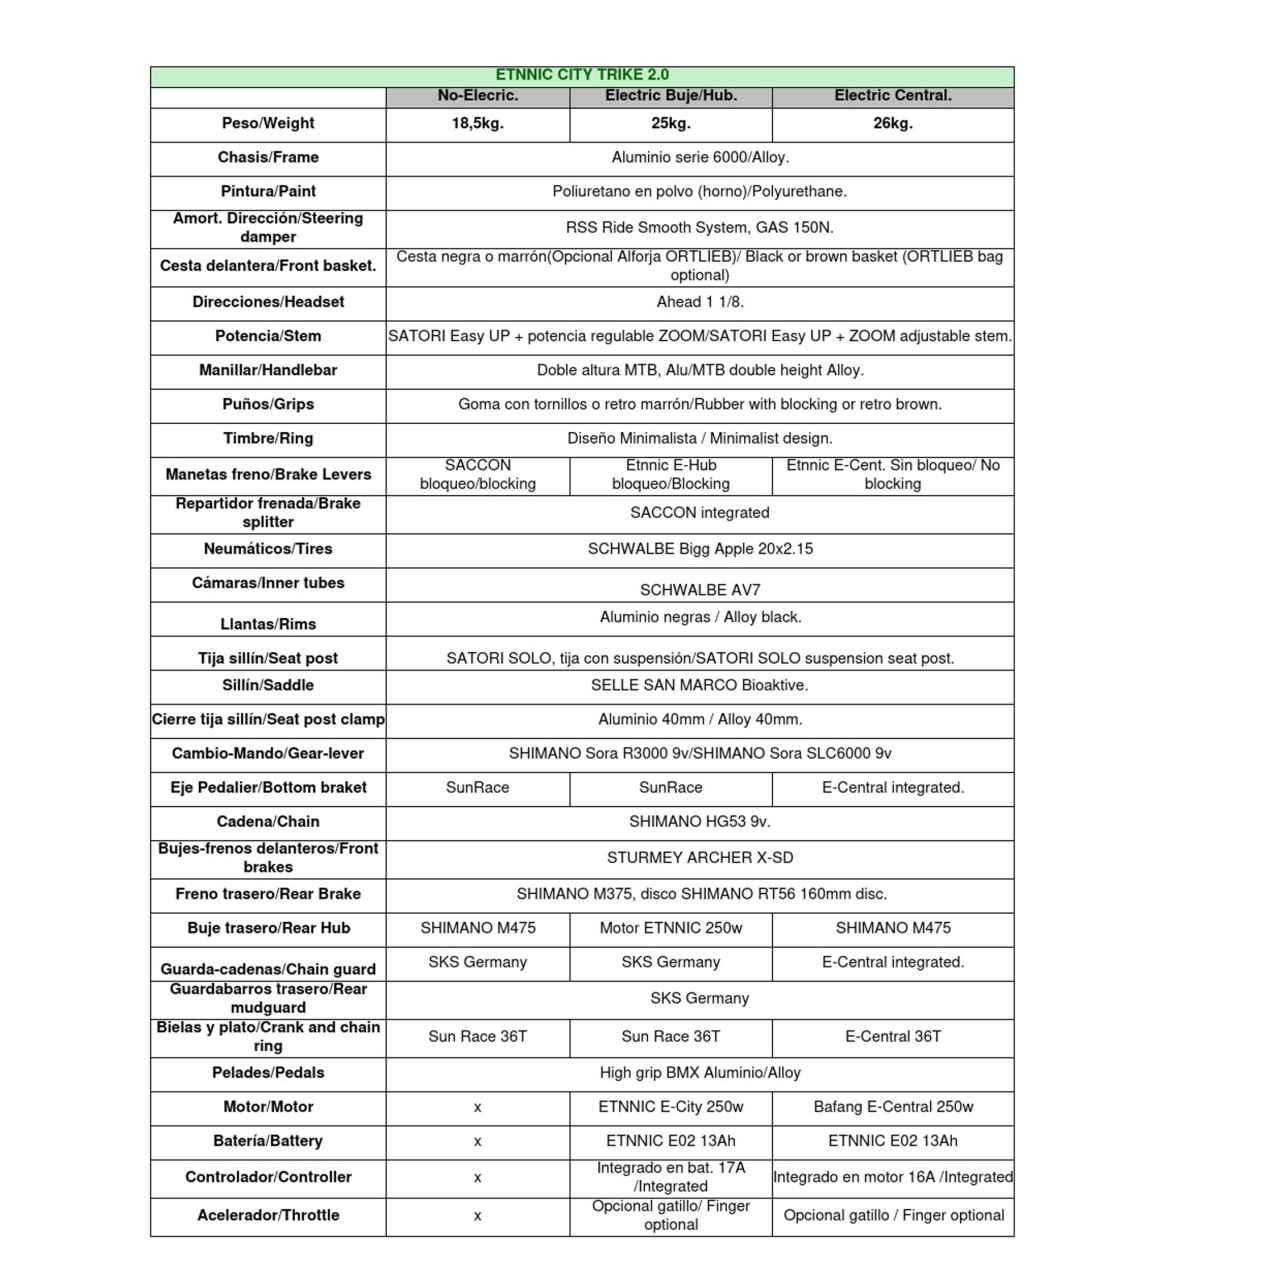 Ficha técnica del  ETNNIC CITY TRIKE 2.0